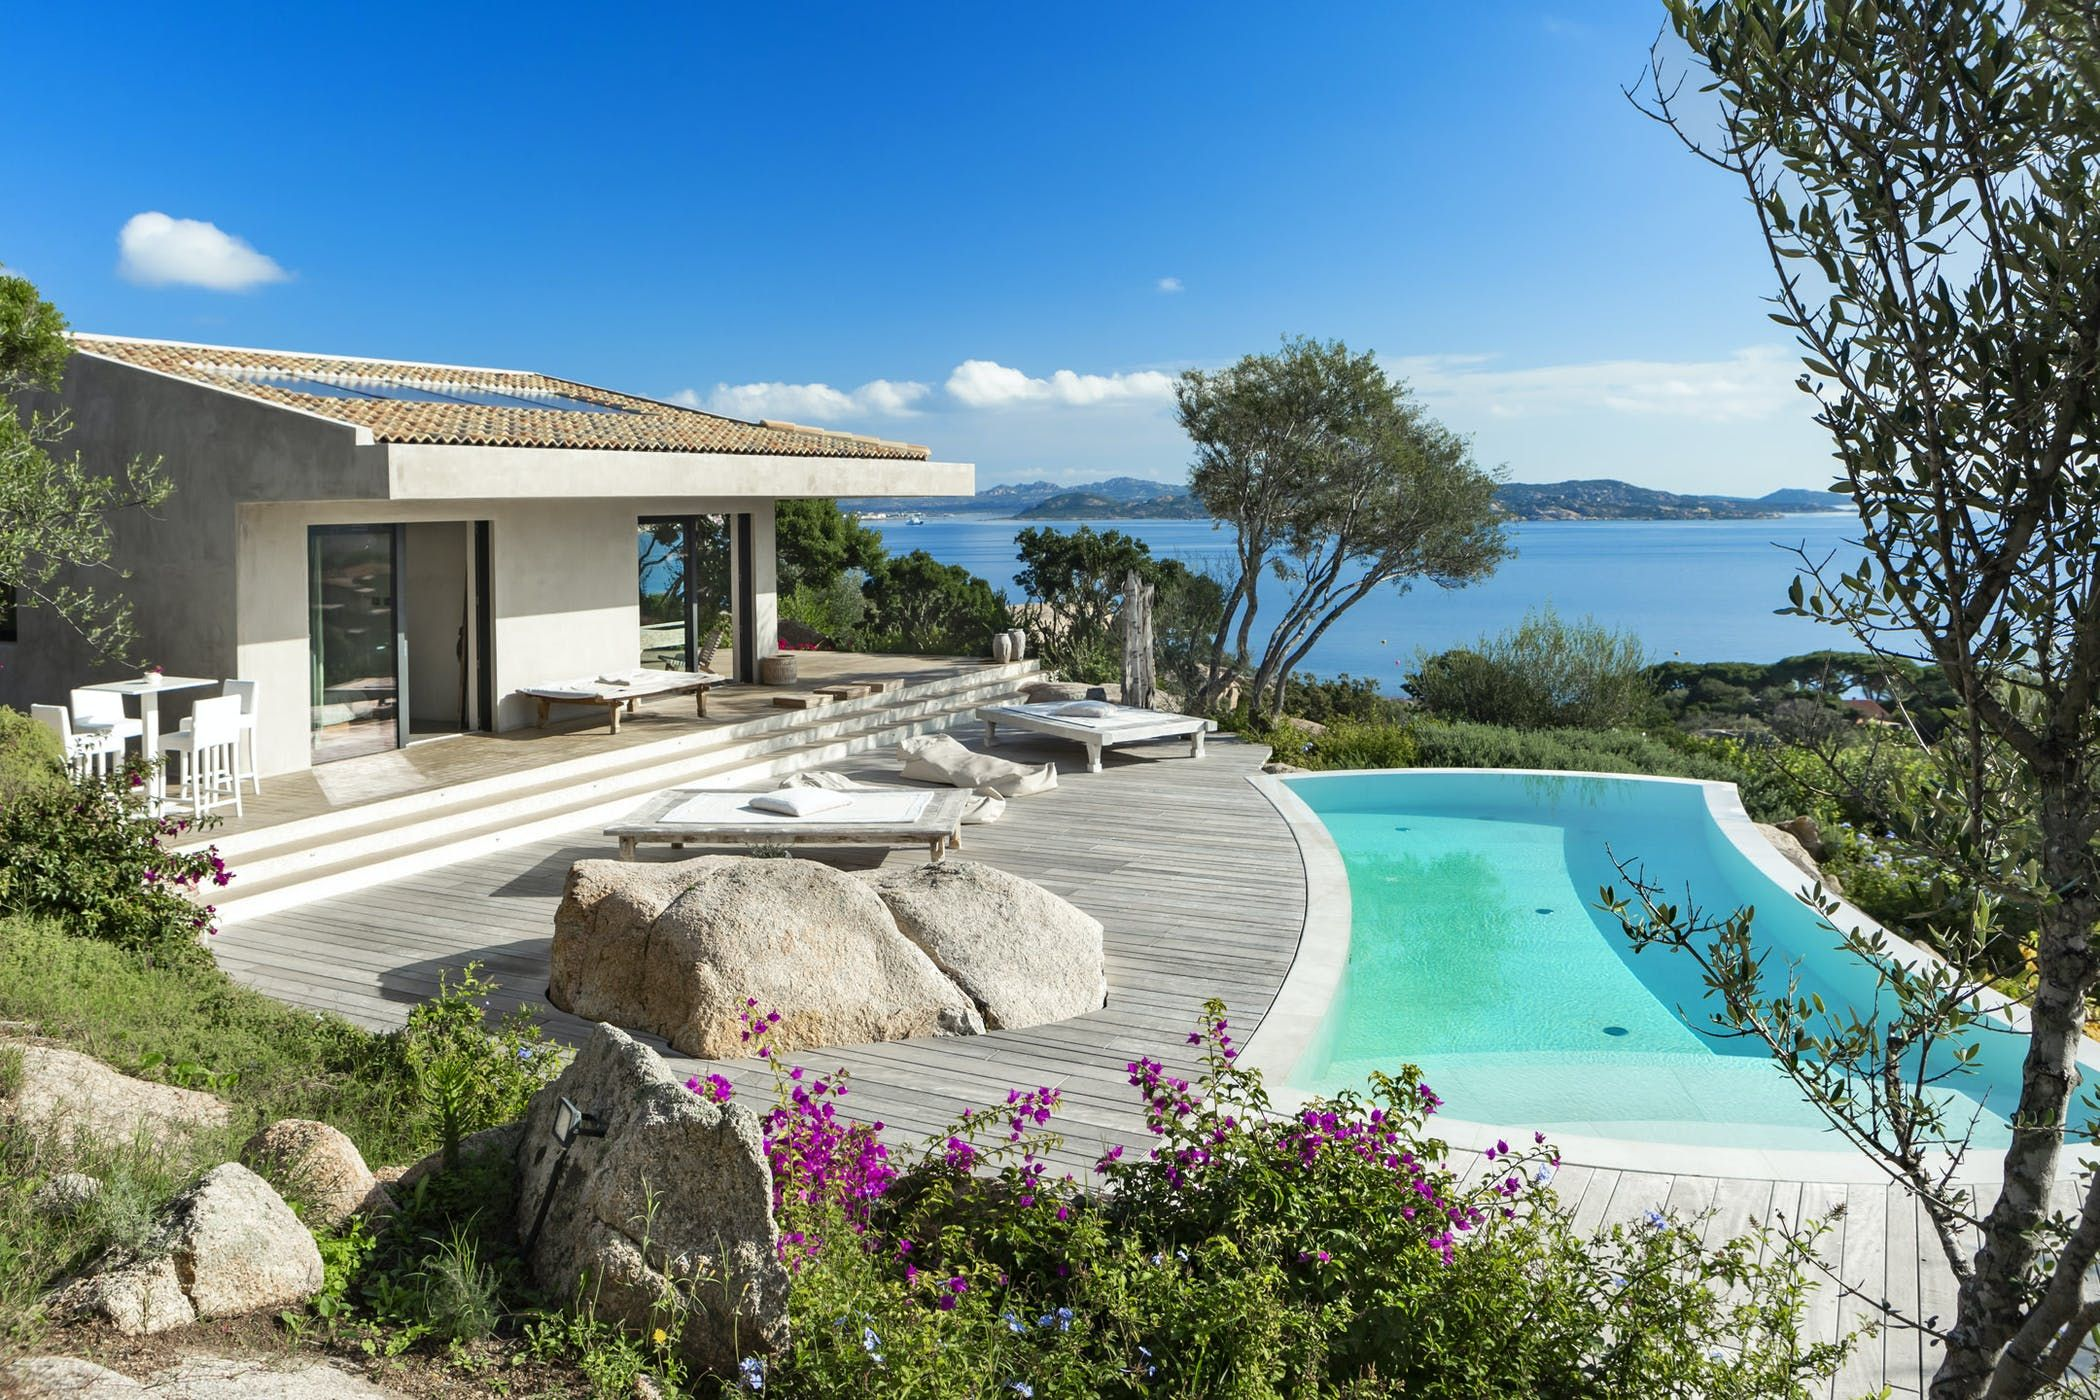 Pin By Indi Rosas On Where To Stay Luxury Villas Italy Villas In Italy Sardinia